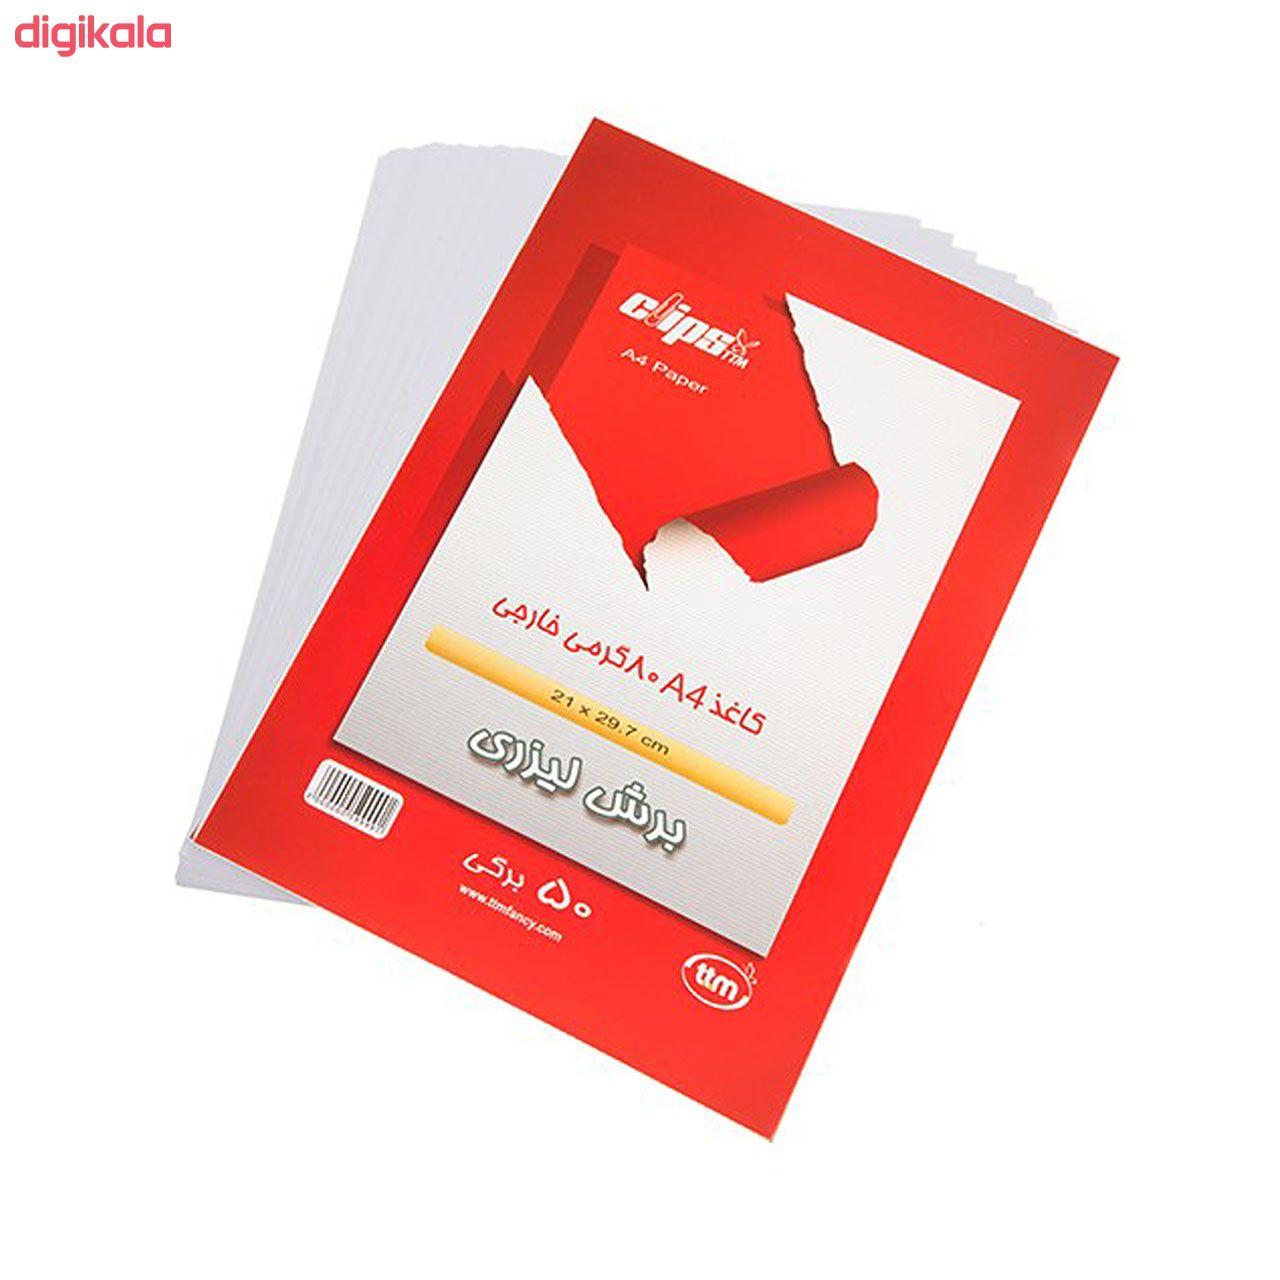 کاغذ A4 کلیپس 80 گرمی بسته 50 عددی main 1 1